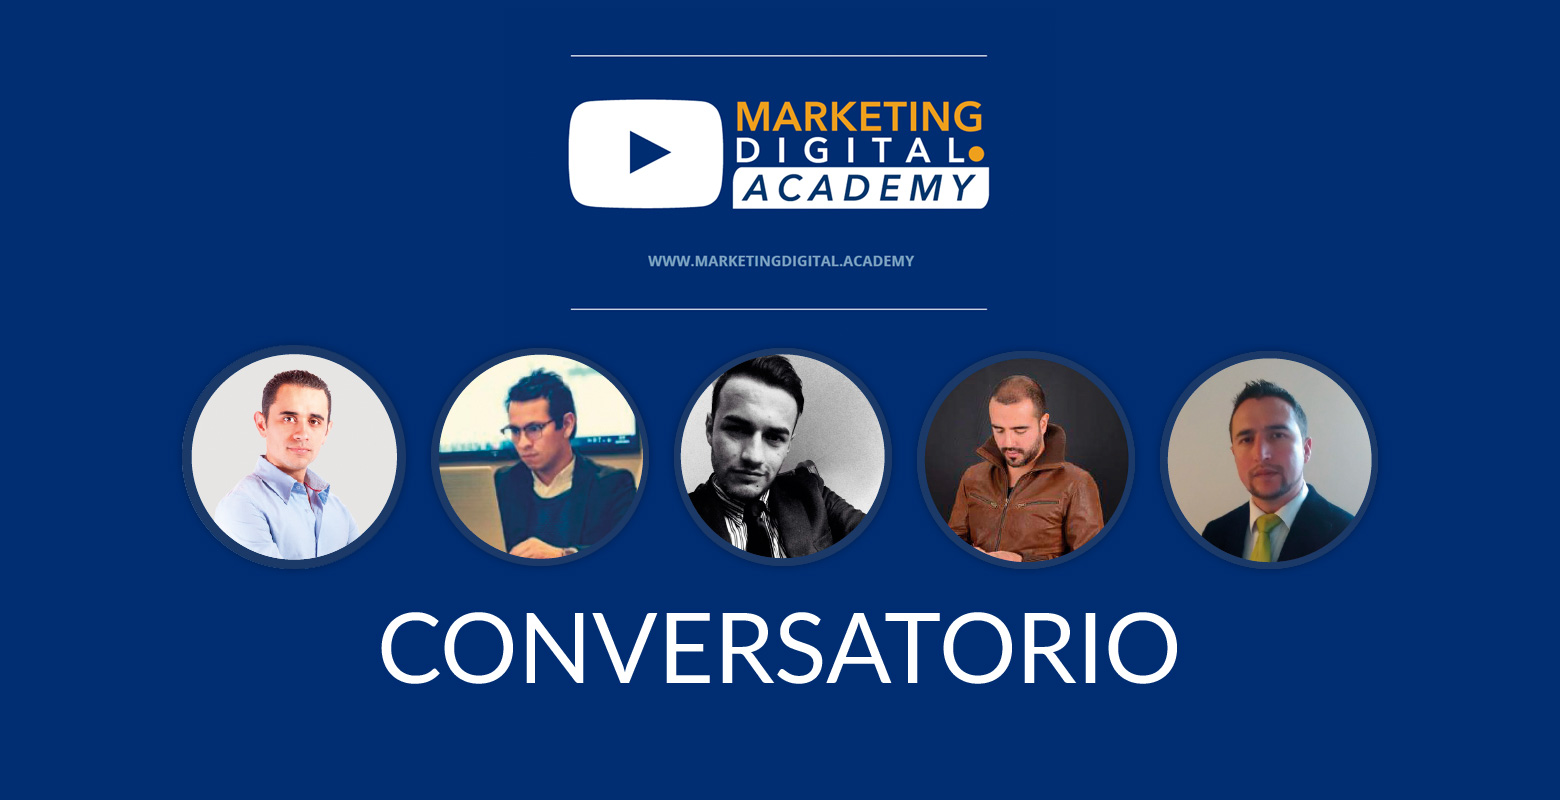 Conversatorio de Digital Marketing Academy